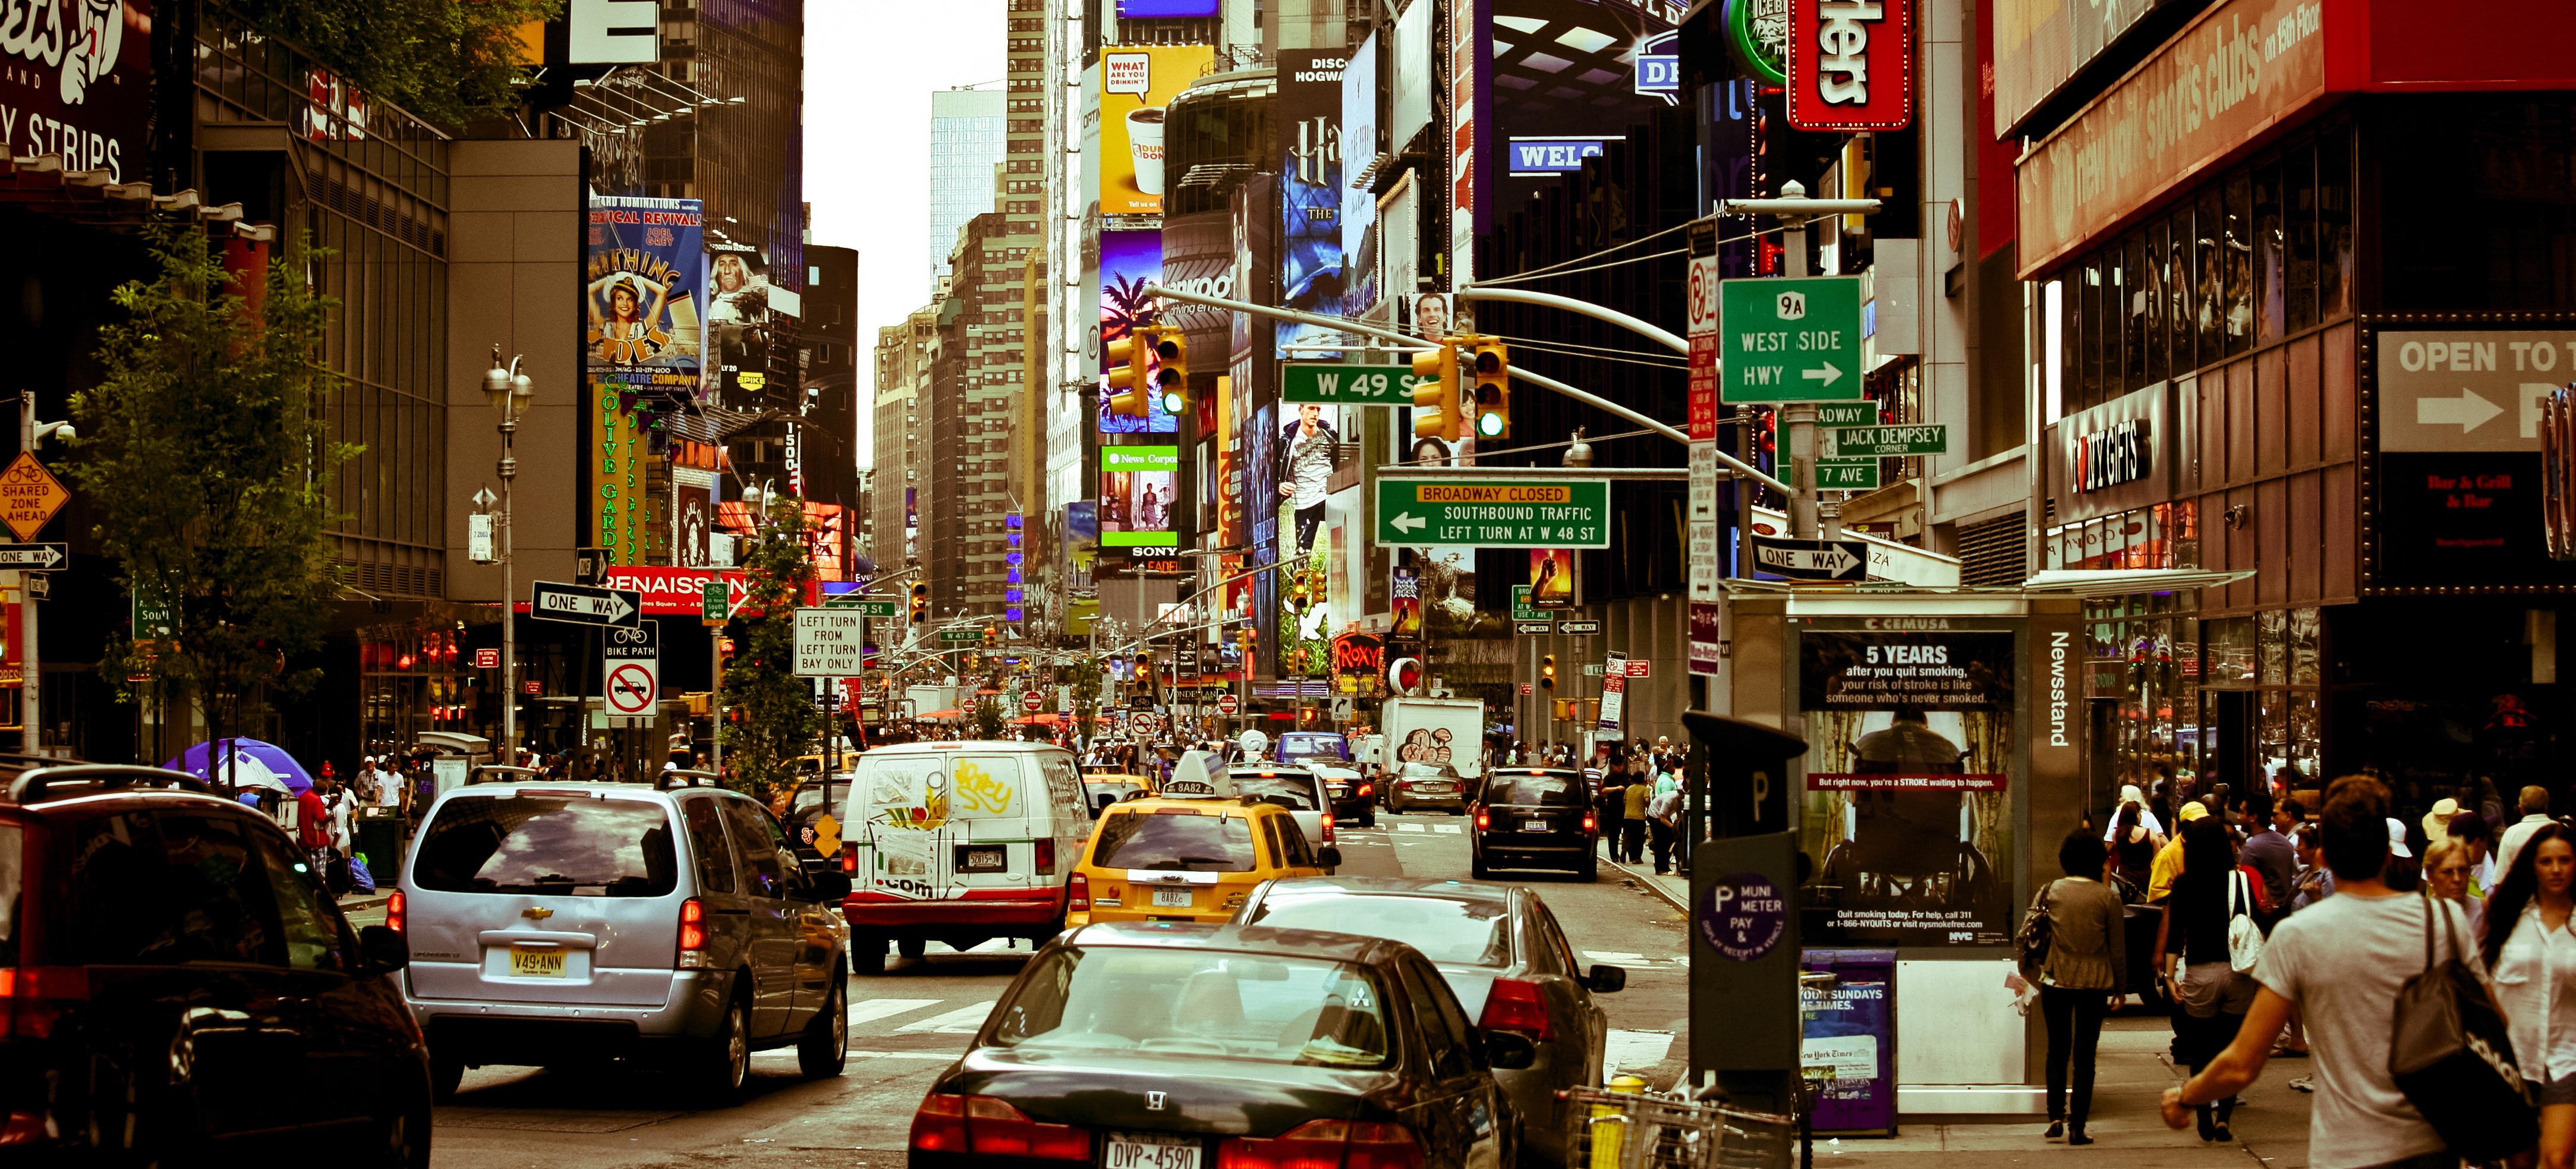 New York city life traffic jam people